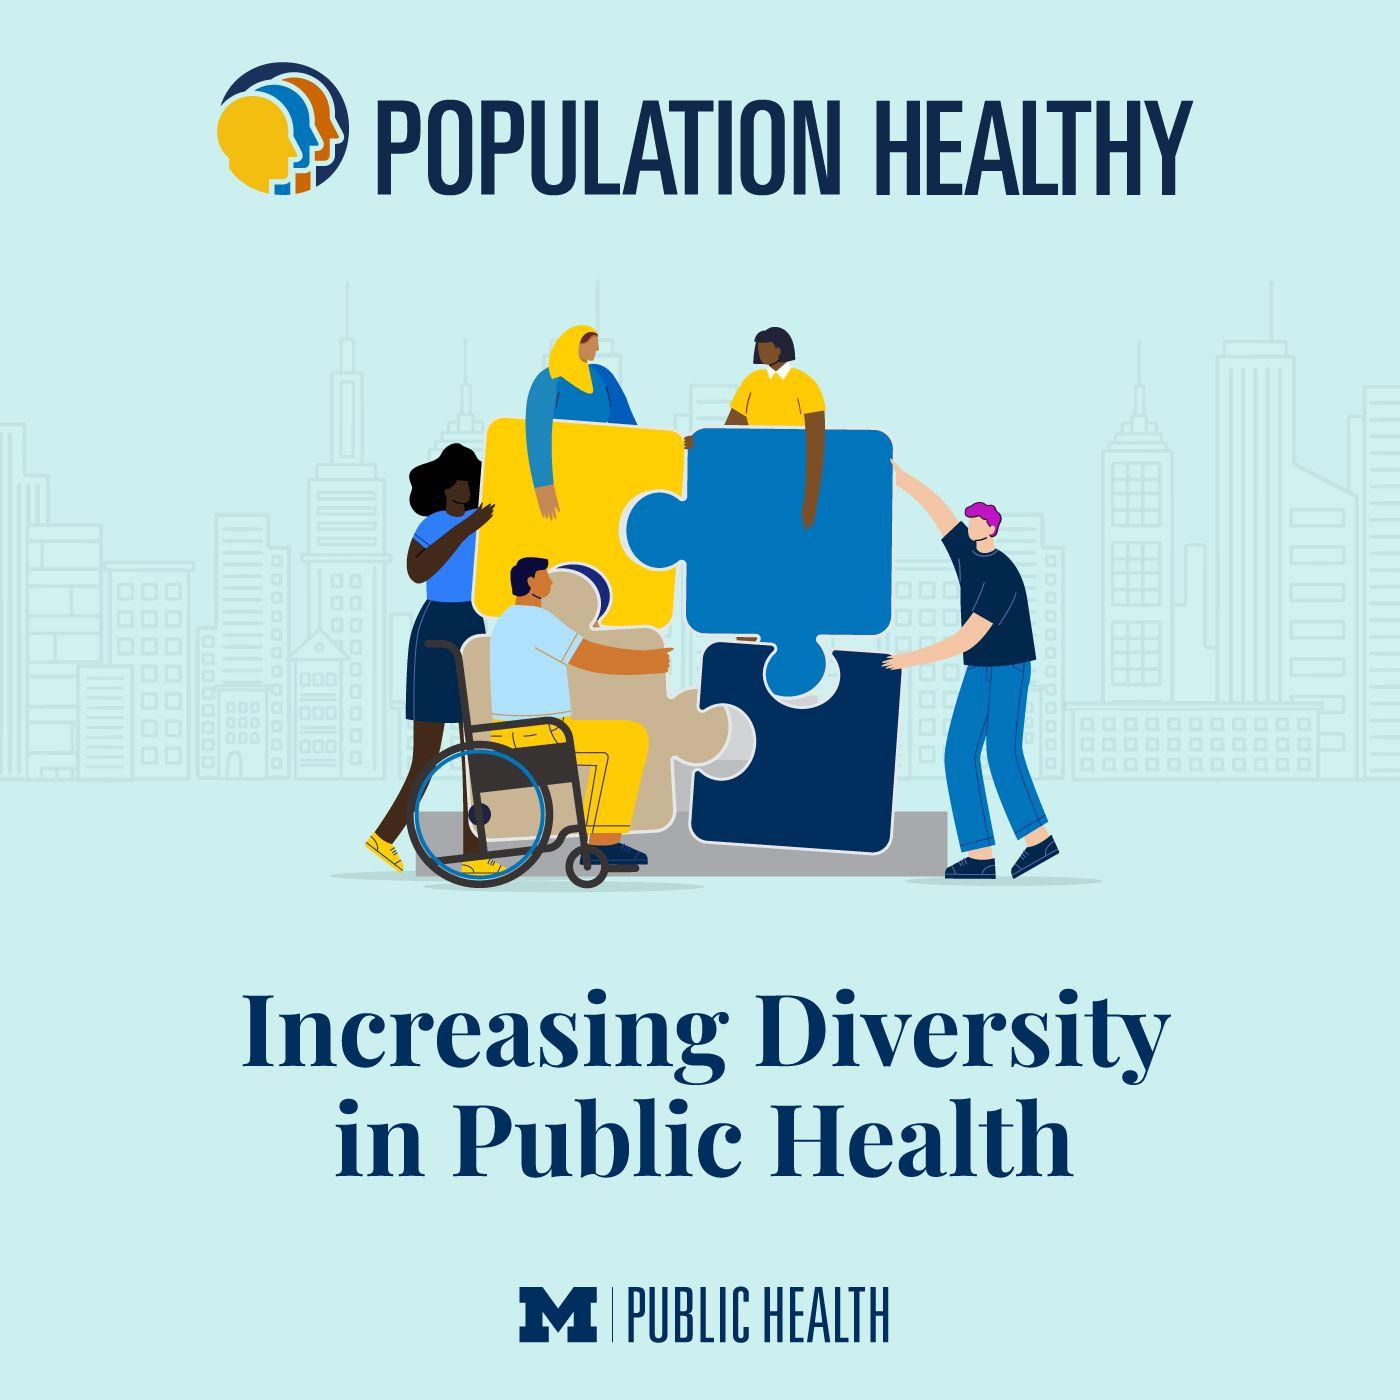 Increasing Diversity in Public Health